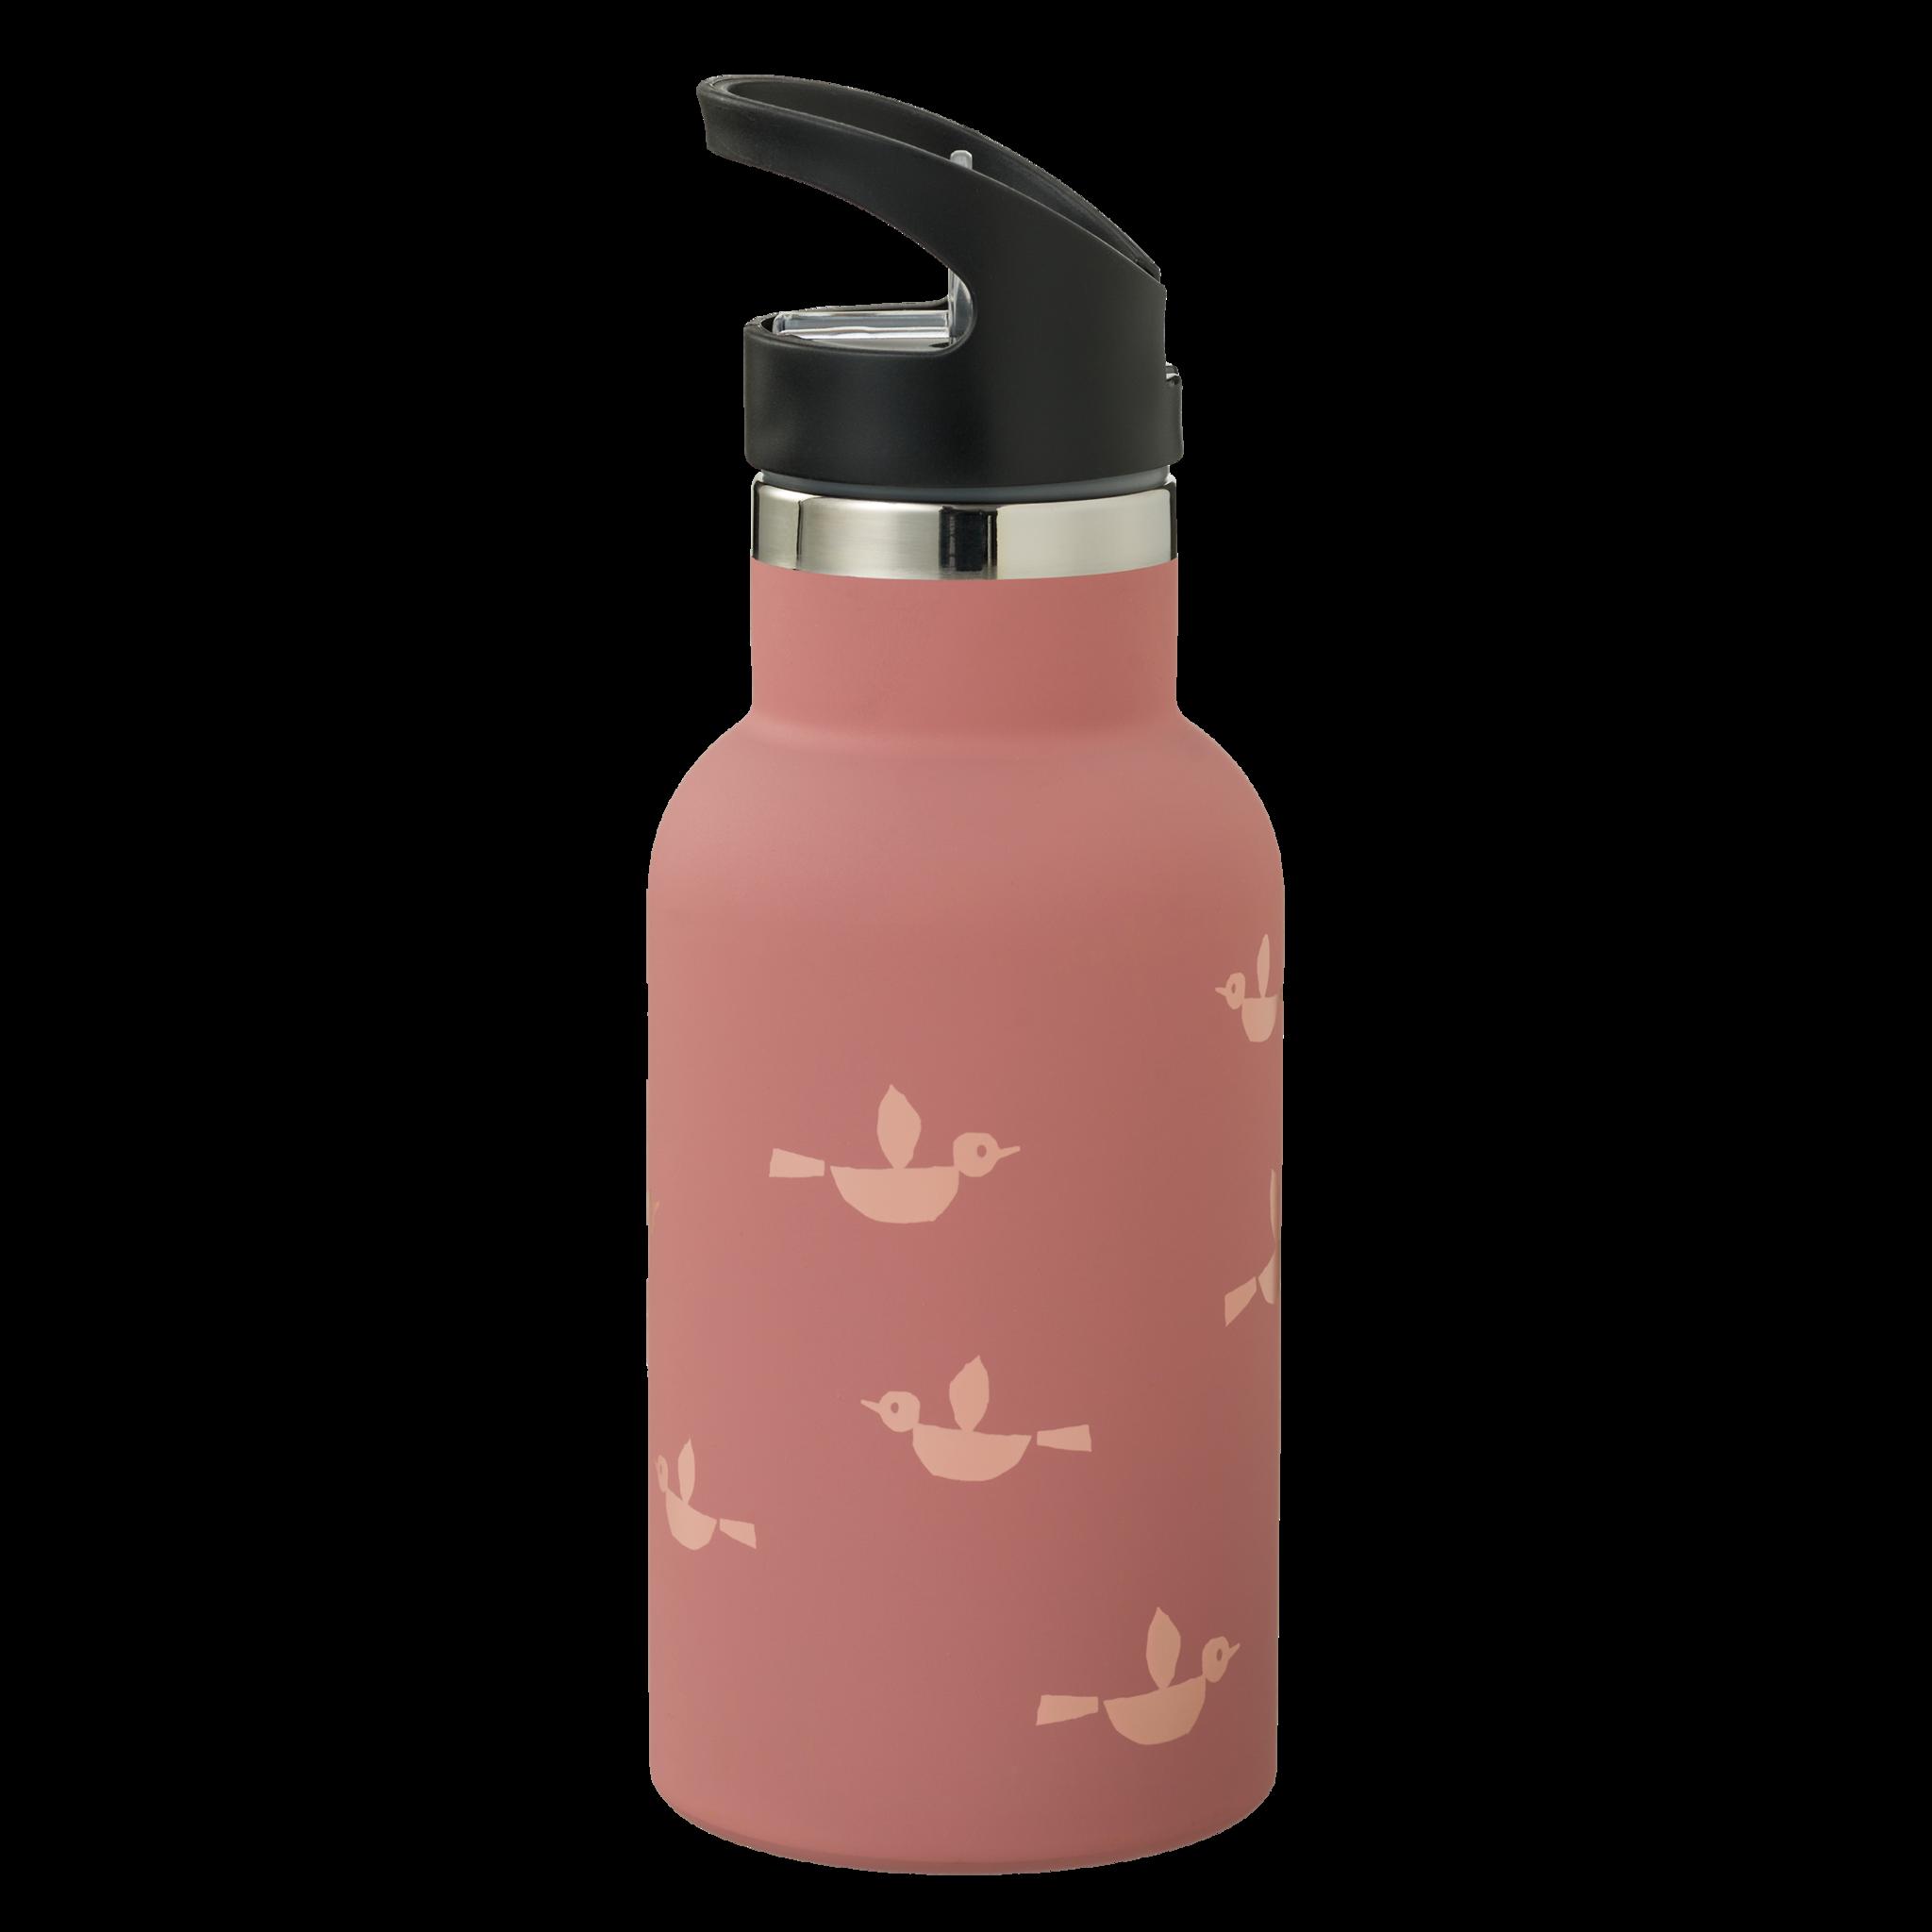 FRESK Thermosflasche/Trinkflasche Nordic Vögel